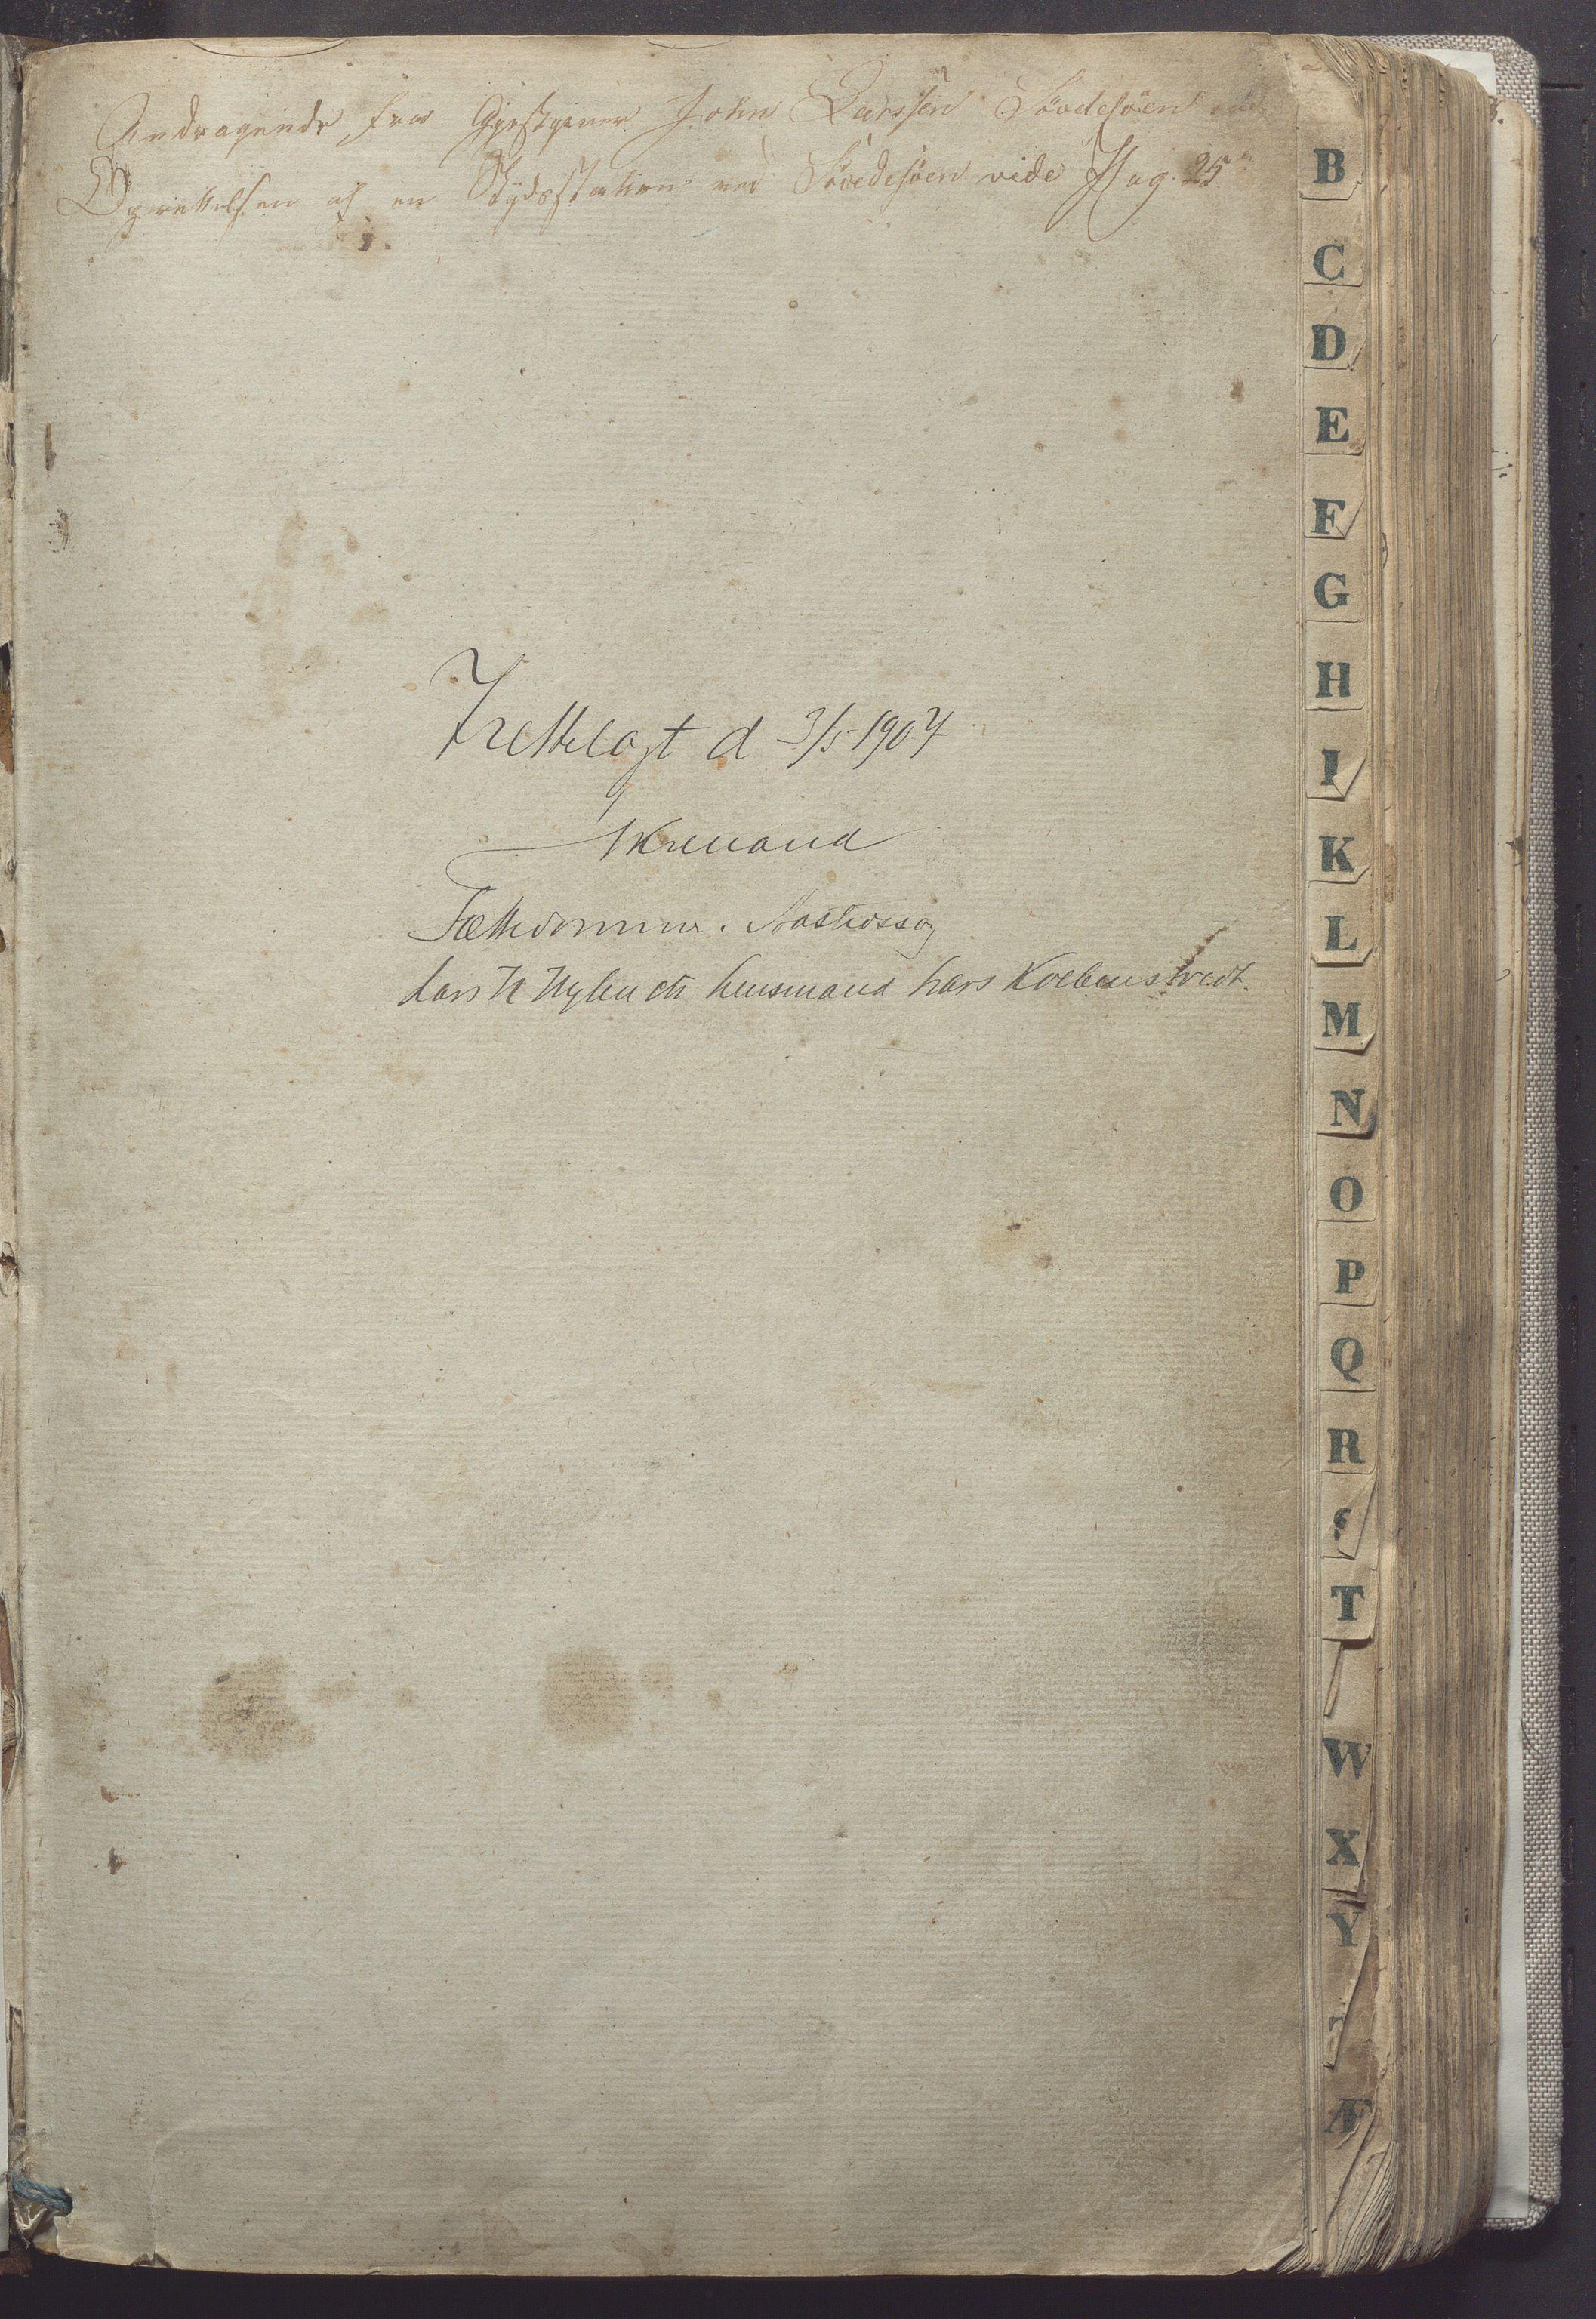 IKAR, Suldal kommune - Formannskapet/Rådmannen, A/Aa/L0001: Møtebok, 1837-1876, s. 1a